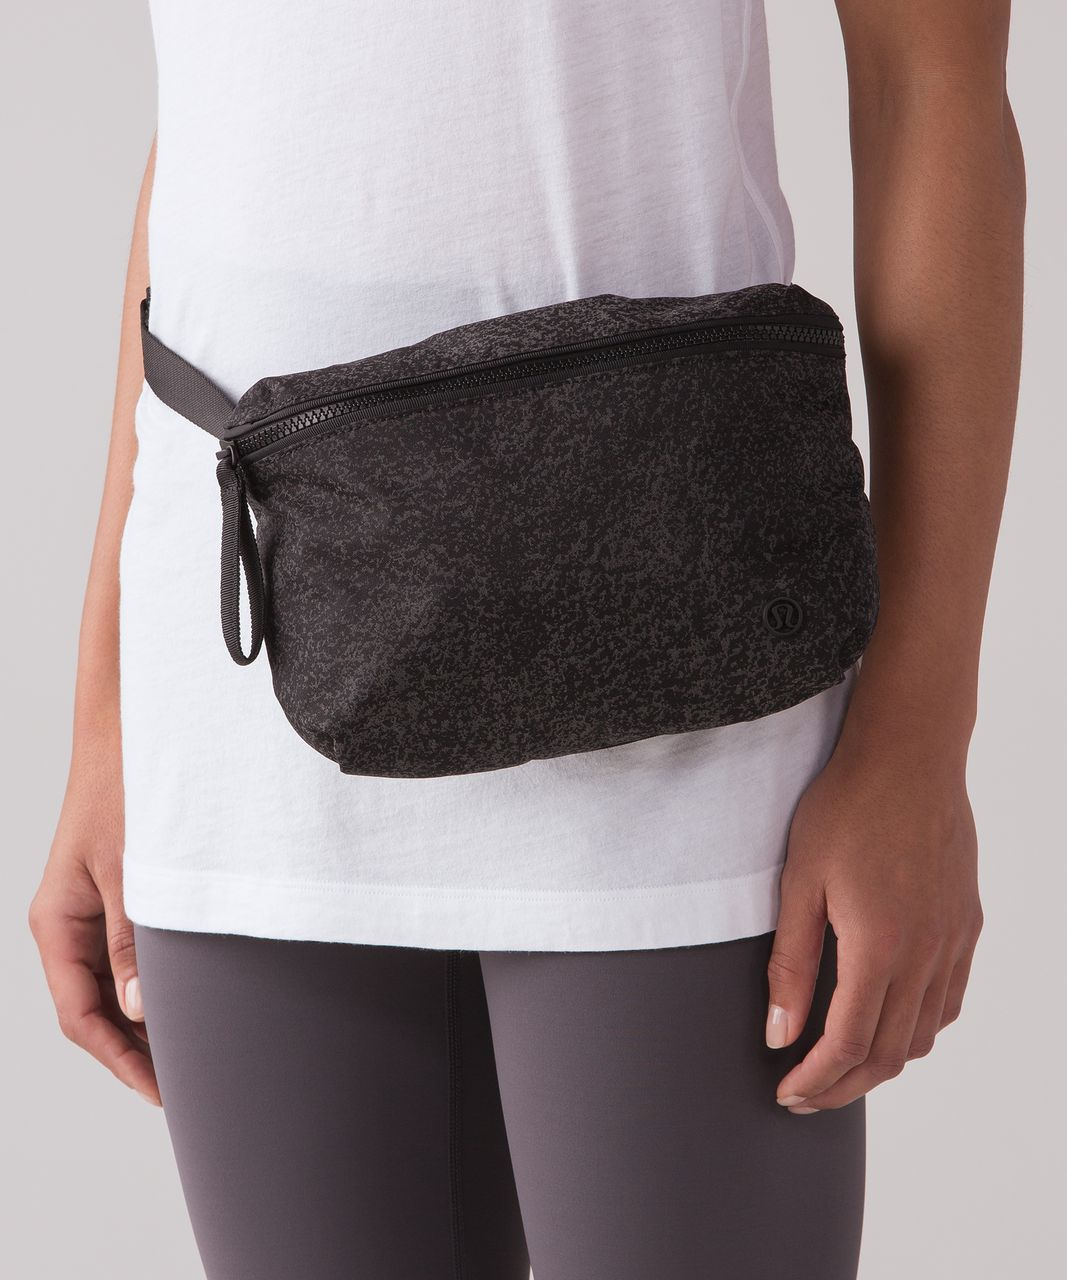 Lululemon Go Lightly Belt Bag Reflective Glo Wild Black